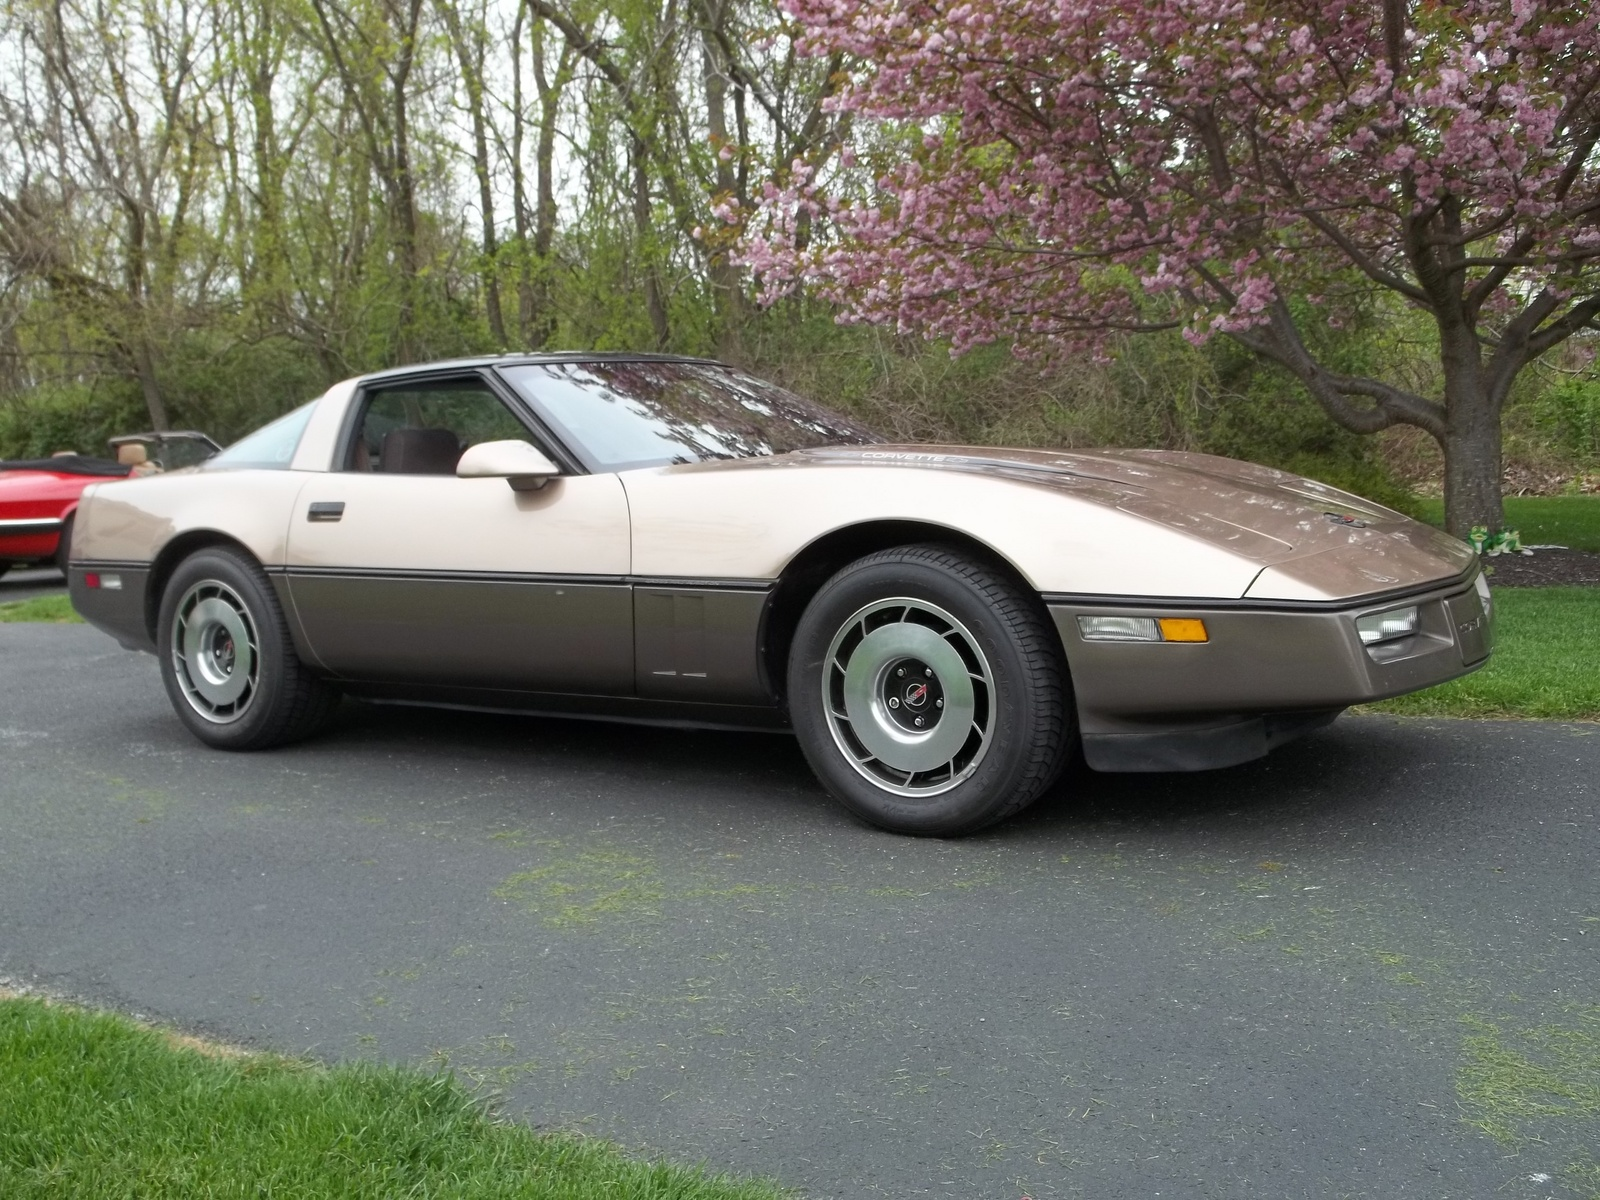 1984 1996 chevrolet corvette c4 dark cars wallpapers. Black Bedroom Furniture Sets. Home Design Ideas